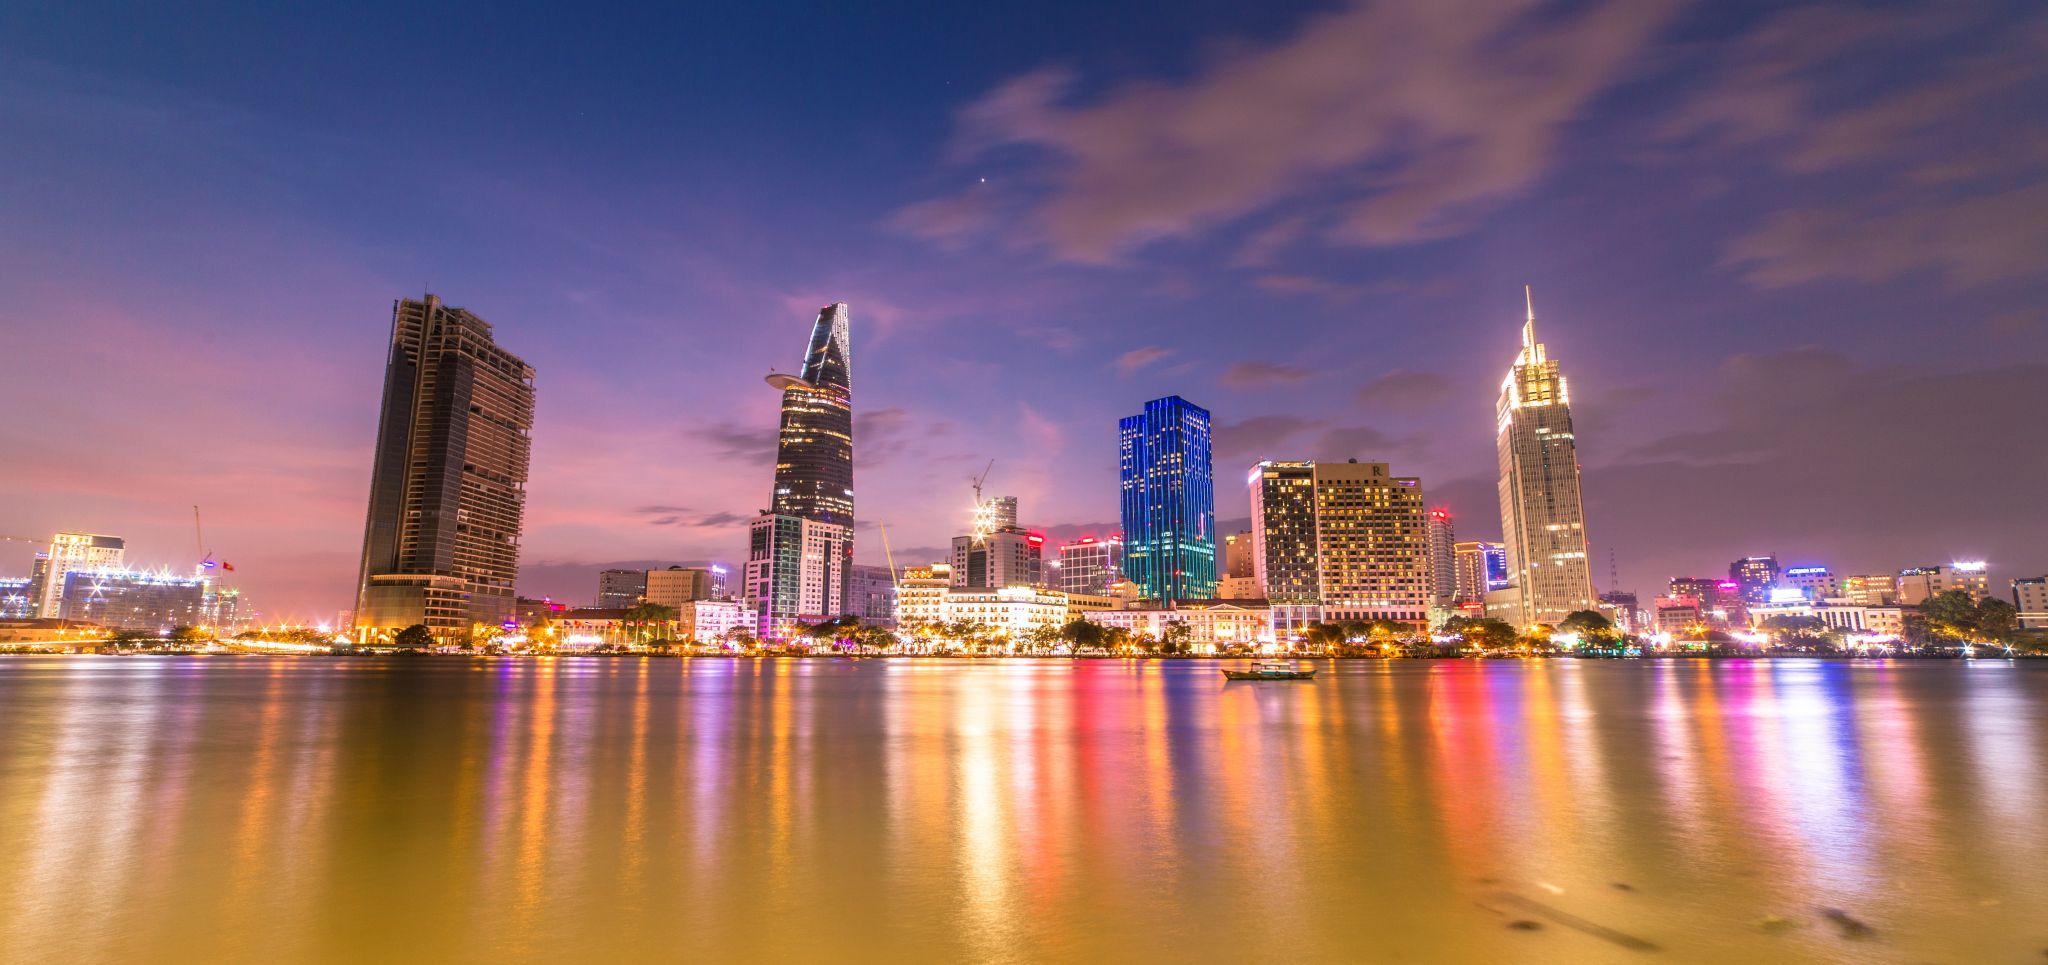 Skyline of Saigon, Vietnam